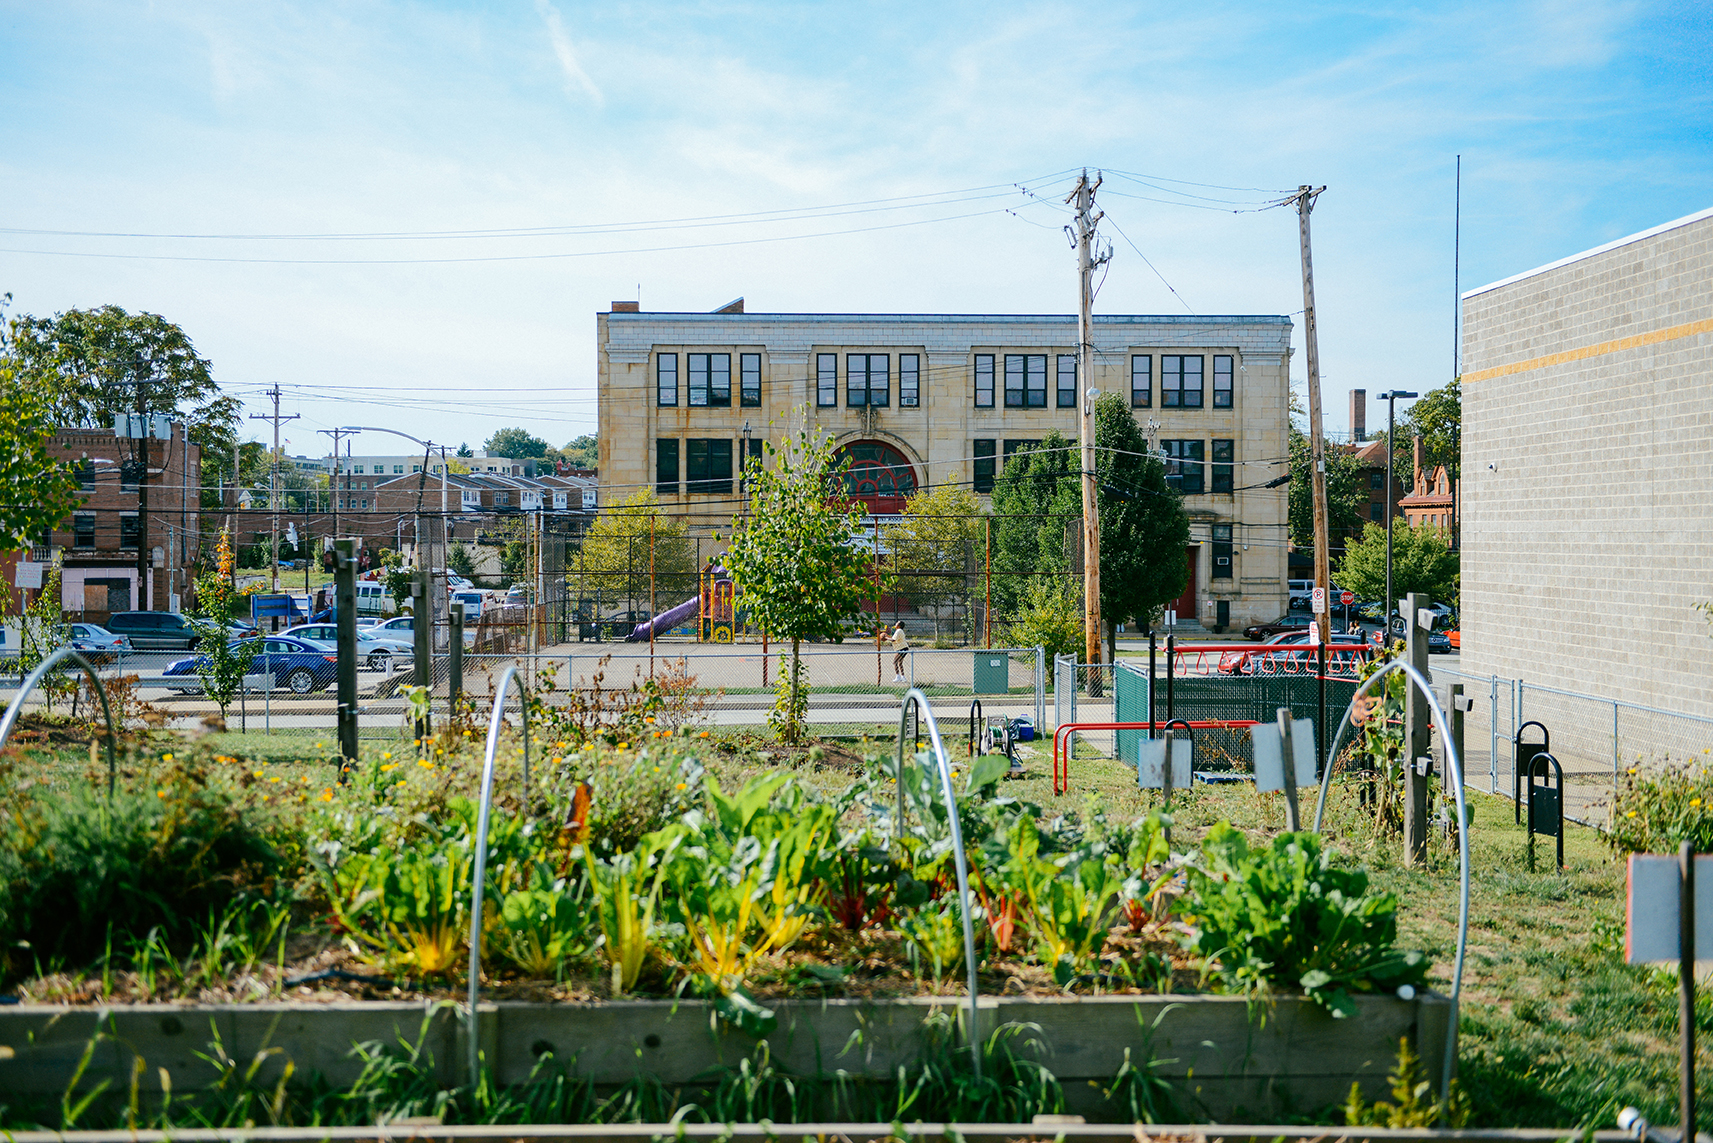 Homewood YMCA Garden by Quelcy 04